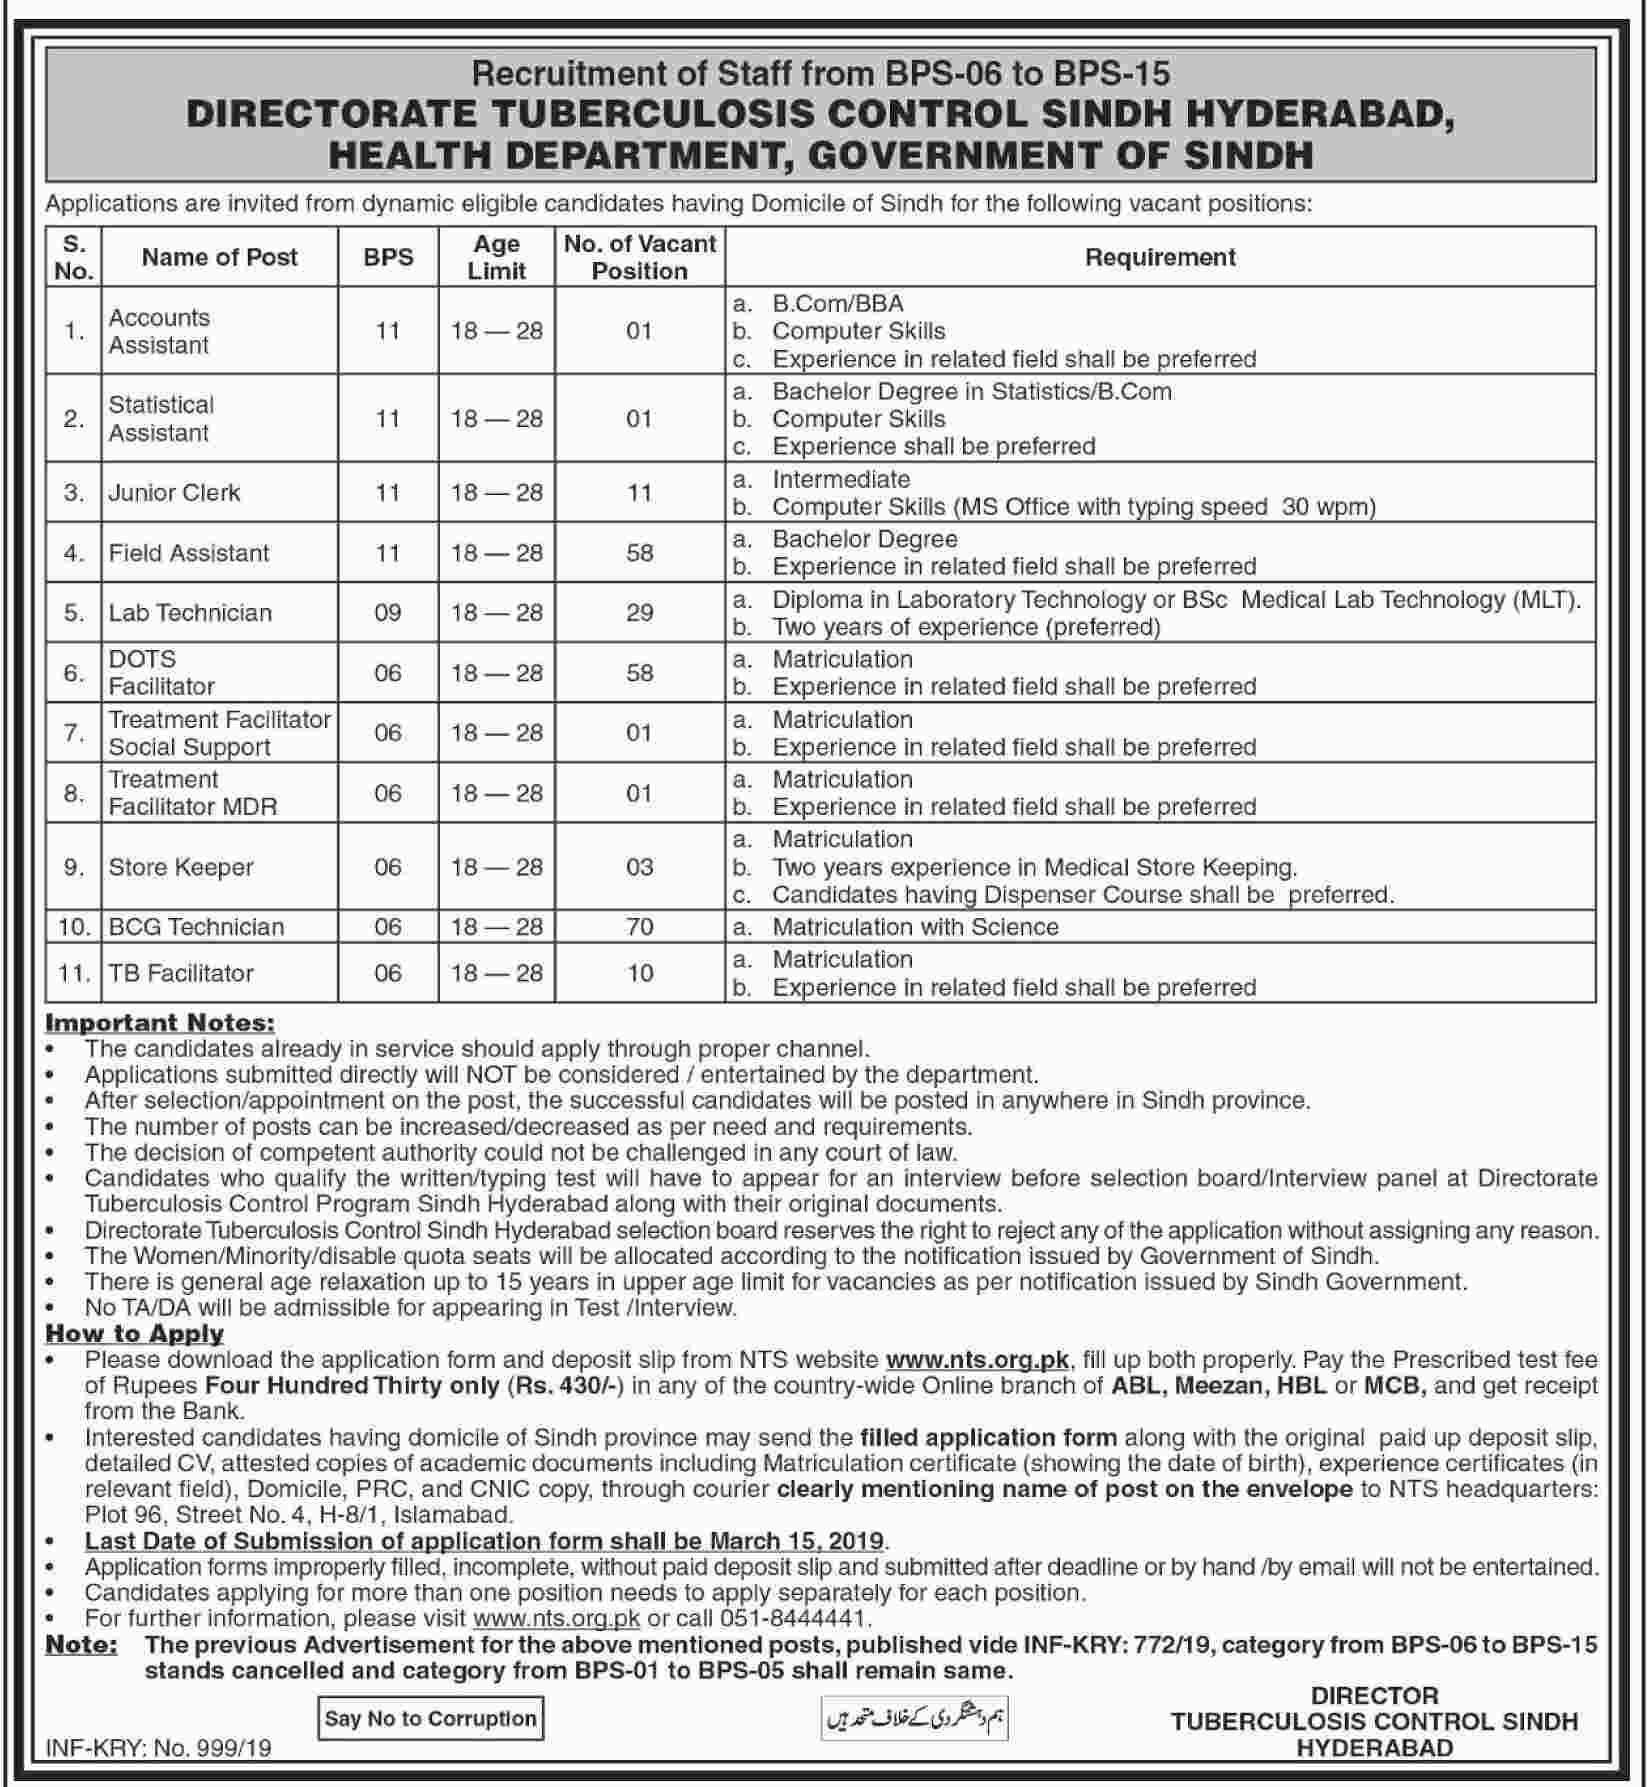 Health Department Govt of Sindh jobs 2019